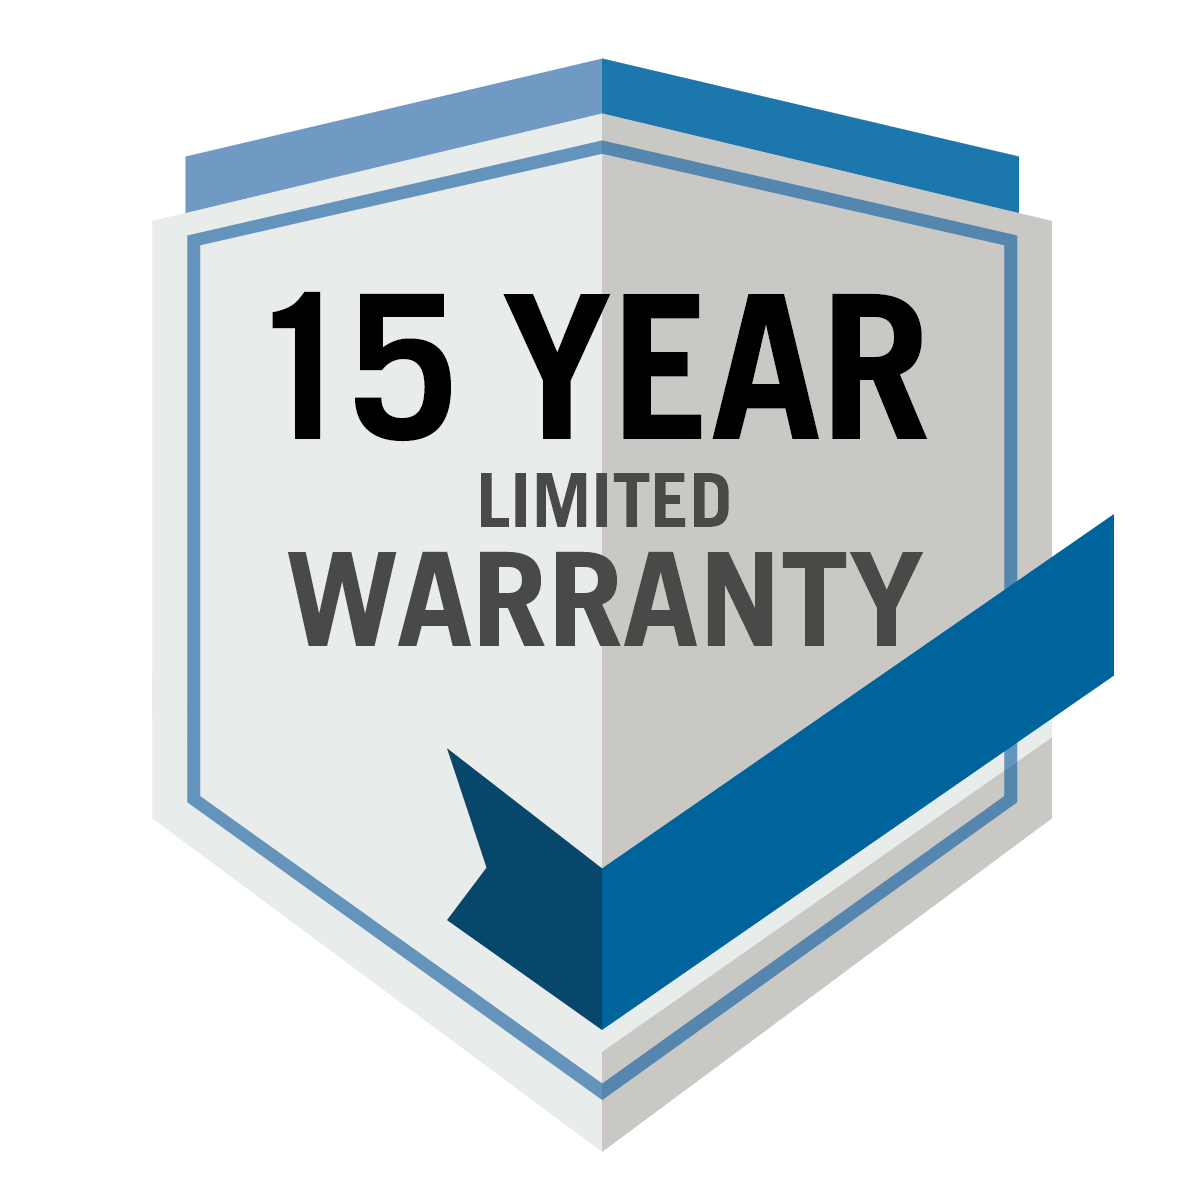 https://assets.koempf24.de/NAPO_15_year_limited_warranty.png?auto=format&fit=max&h=800&q=75&w=1110